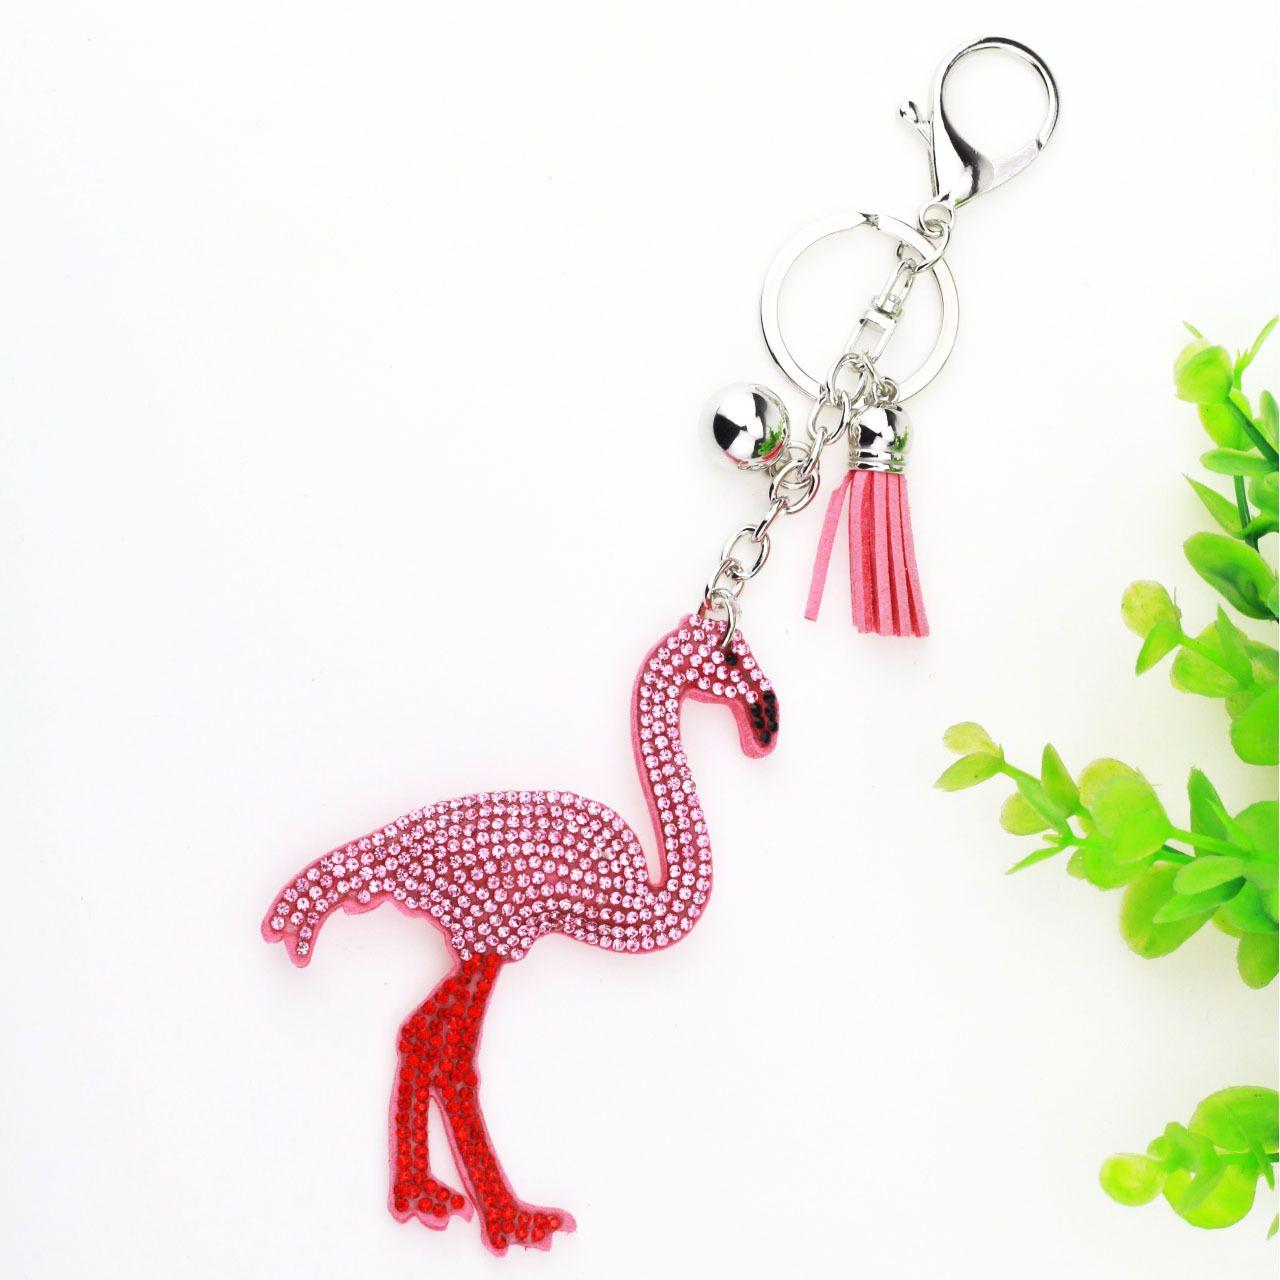 Novel Key Rings Pendants Gifts  Luggage   Bags Accessories Carro Keychains  Phone Flamingo Diamond Women ffe66c9a0